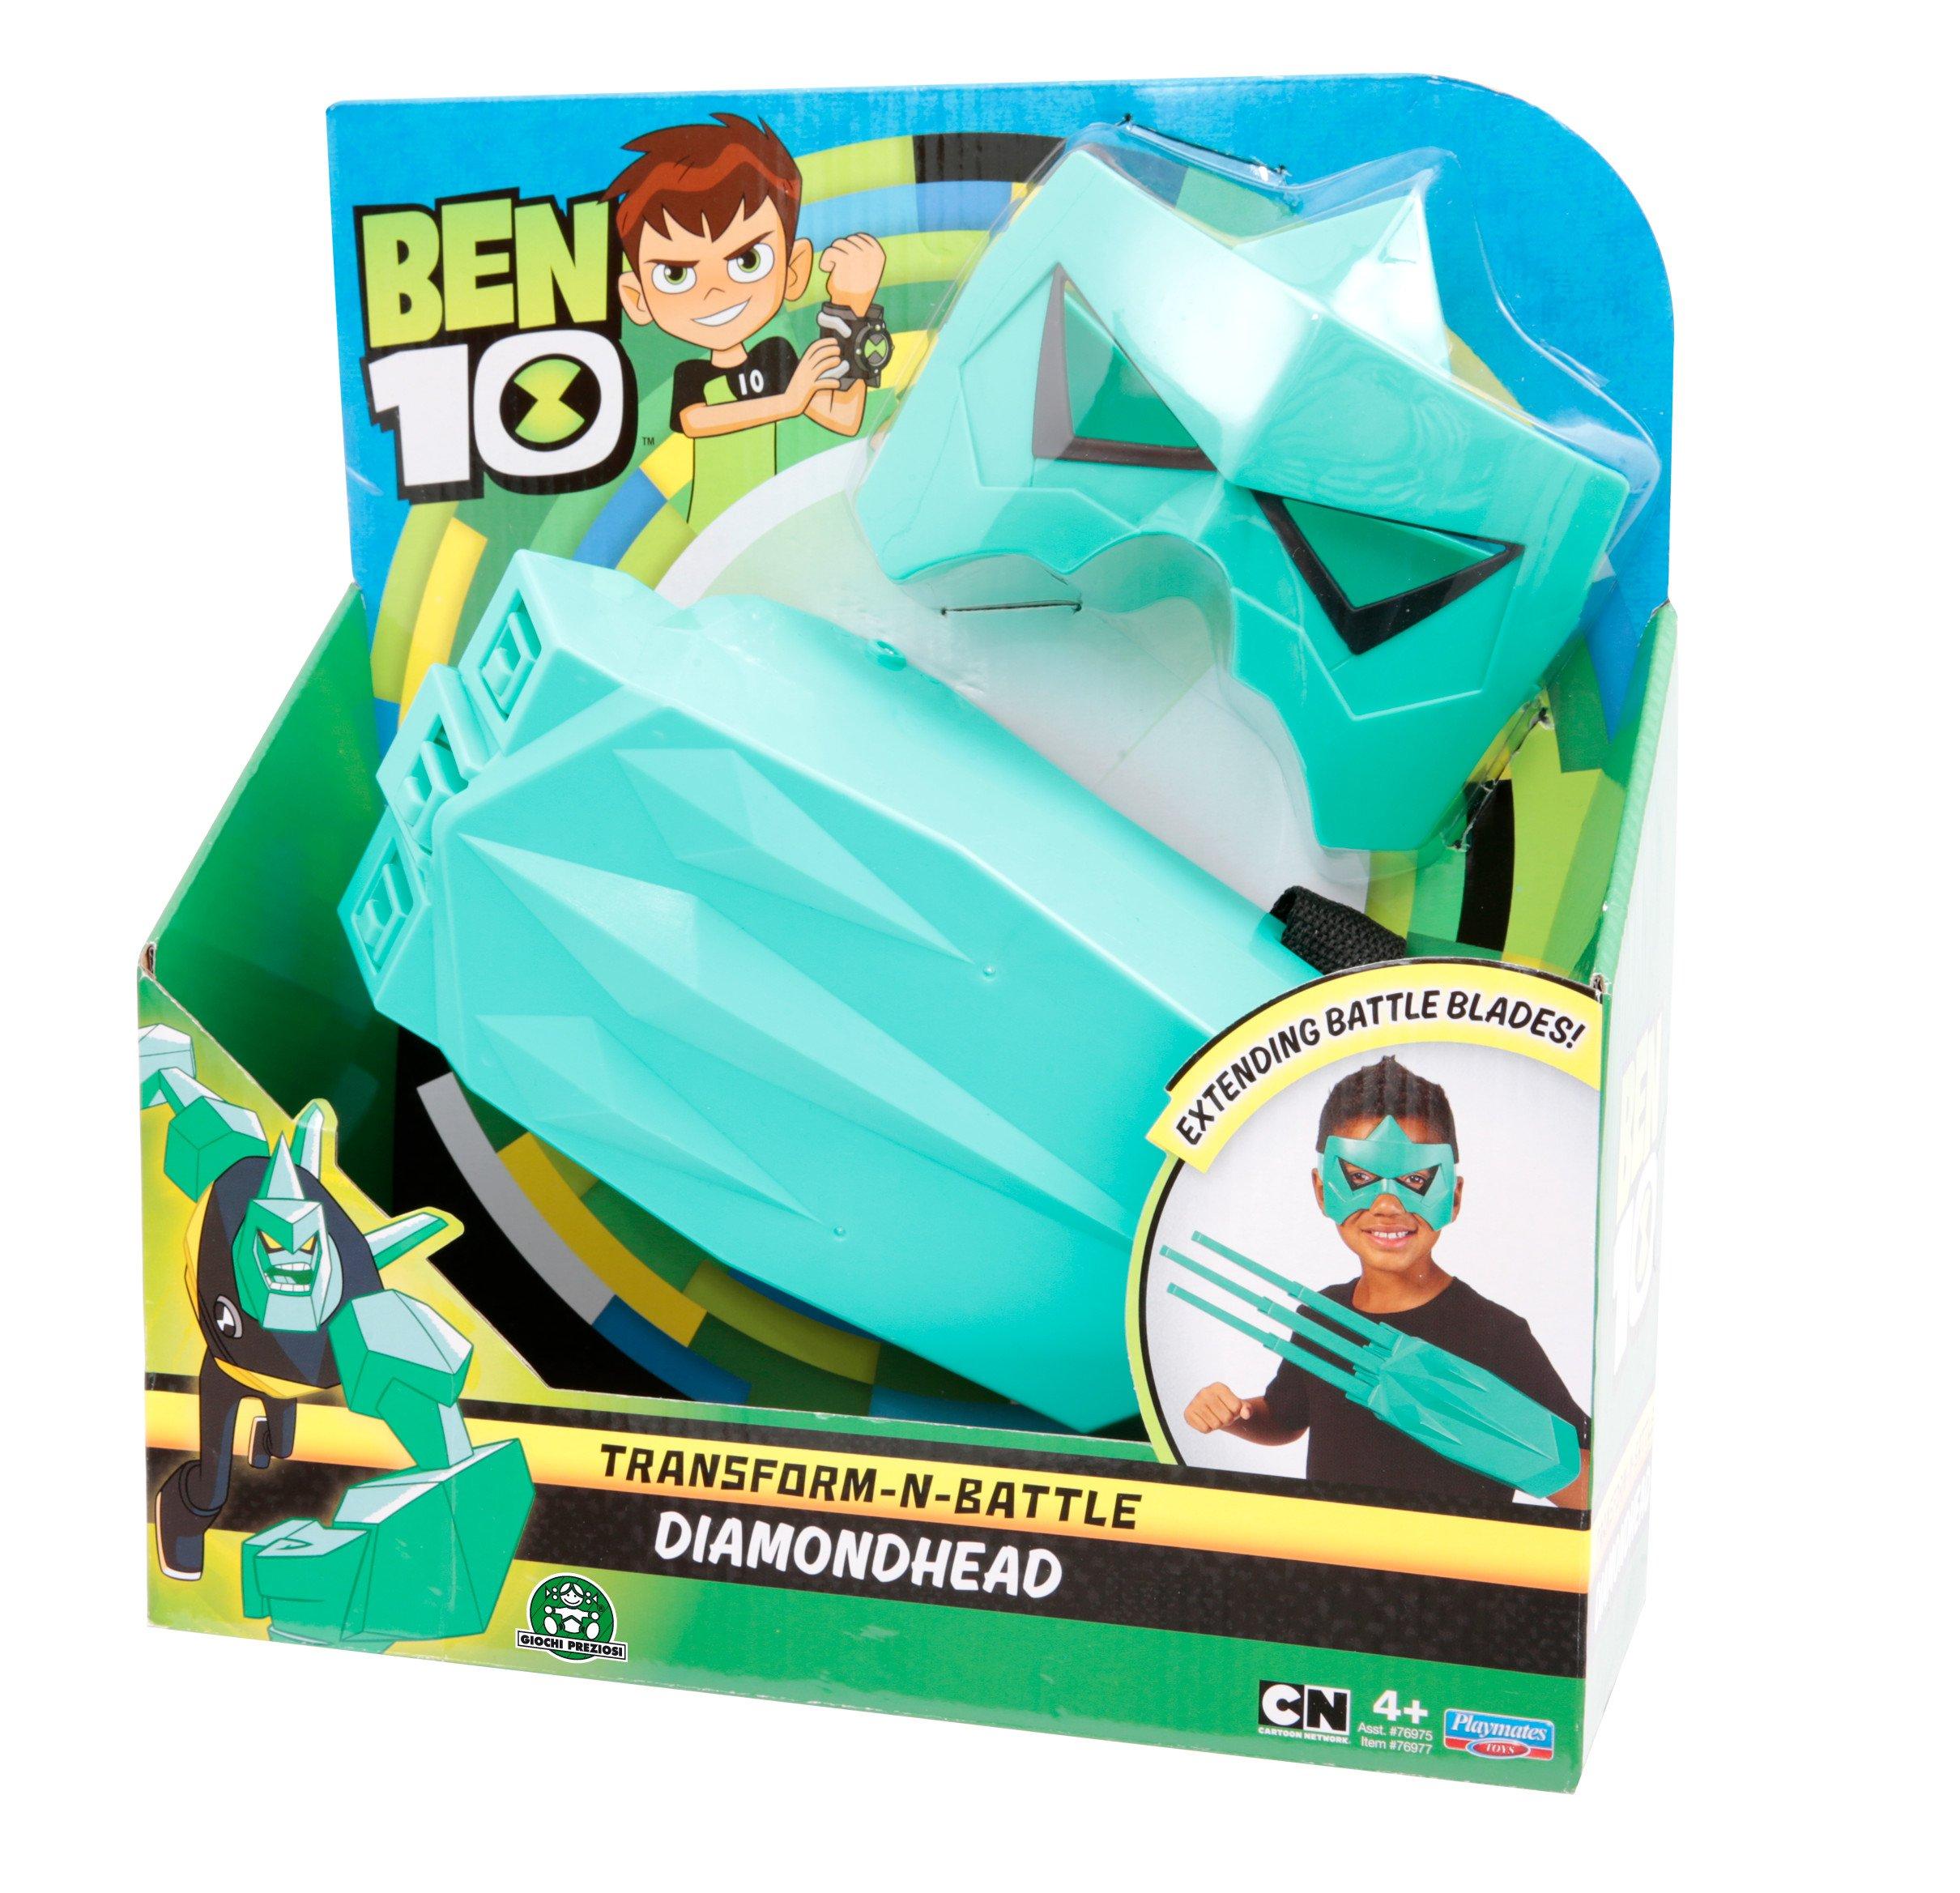 Ben 10 BEN06200 Transform-N-Battle Diamondhead Gauntlet